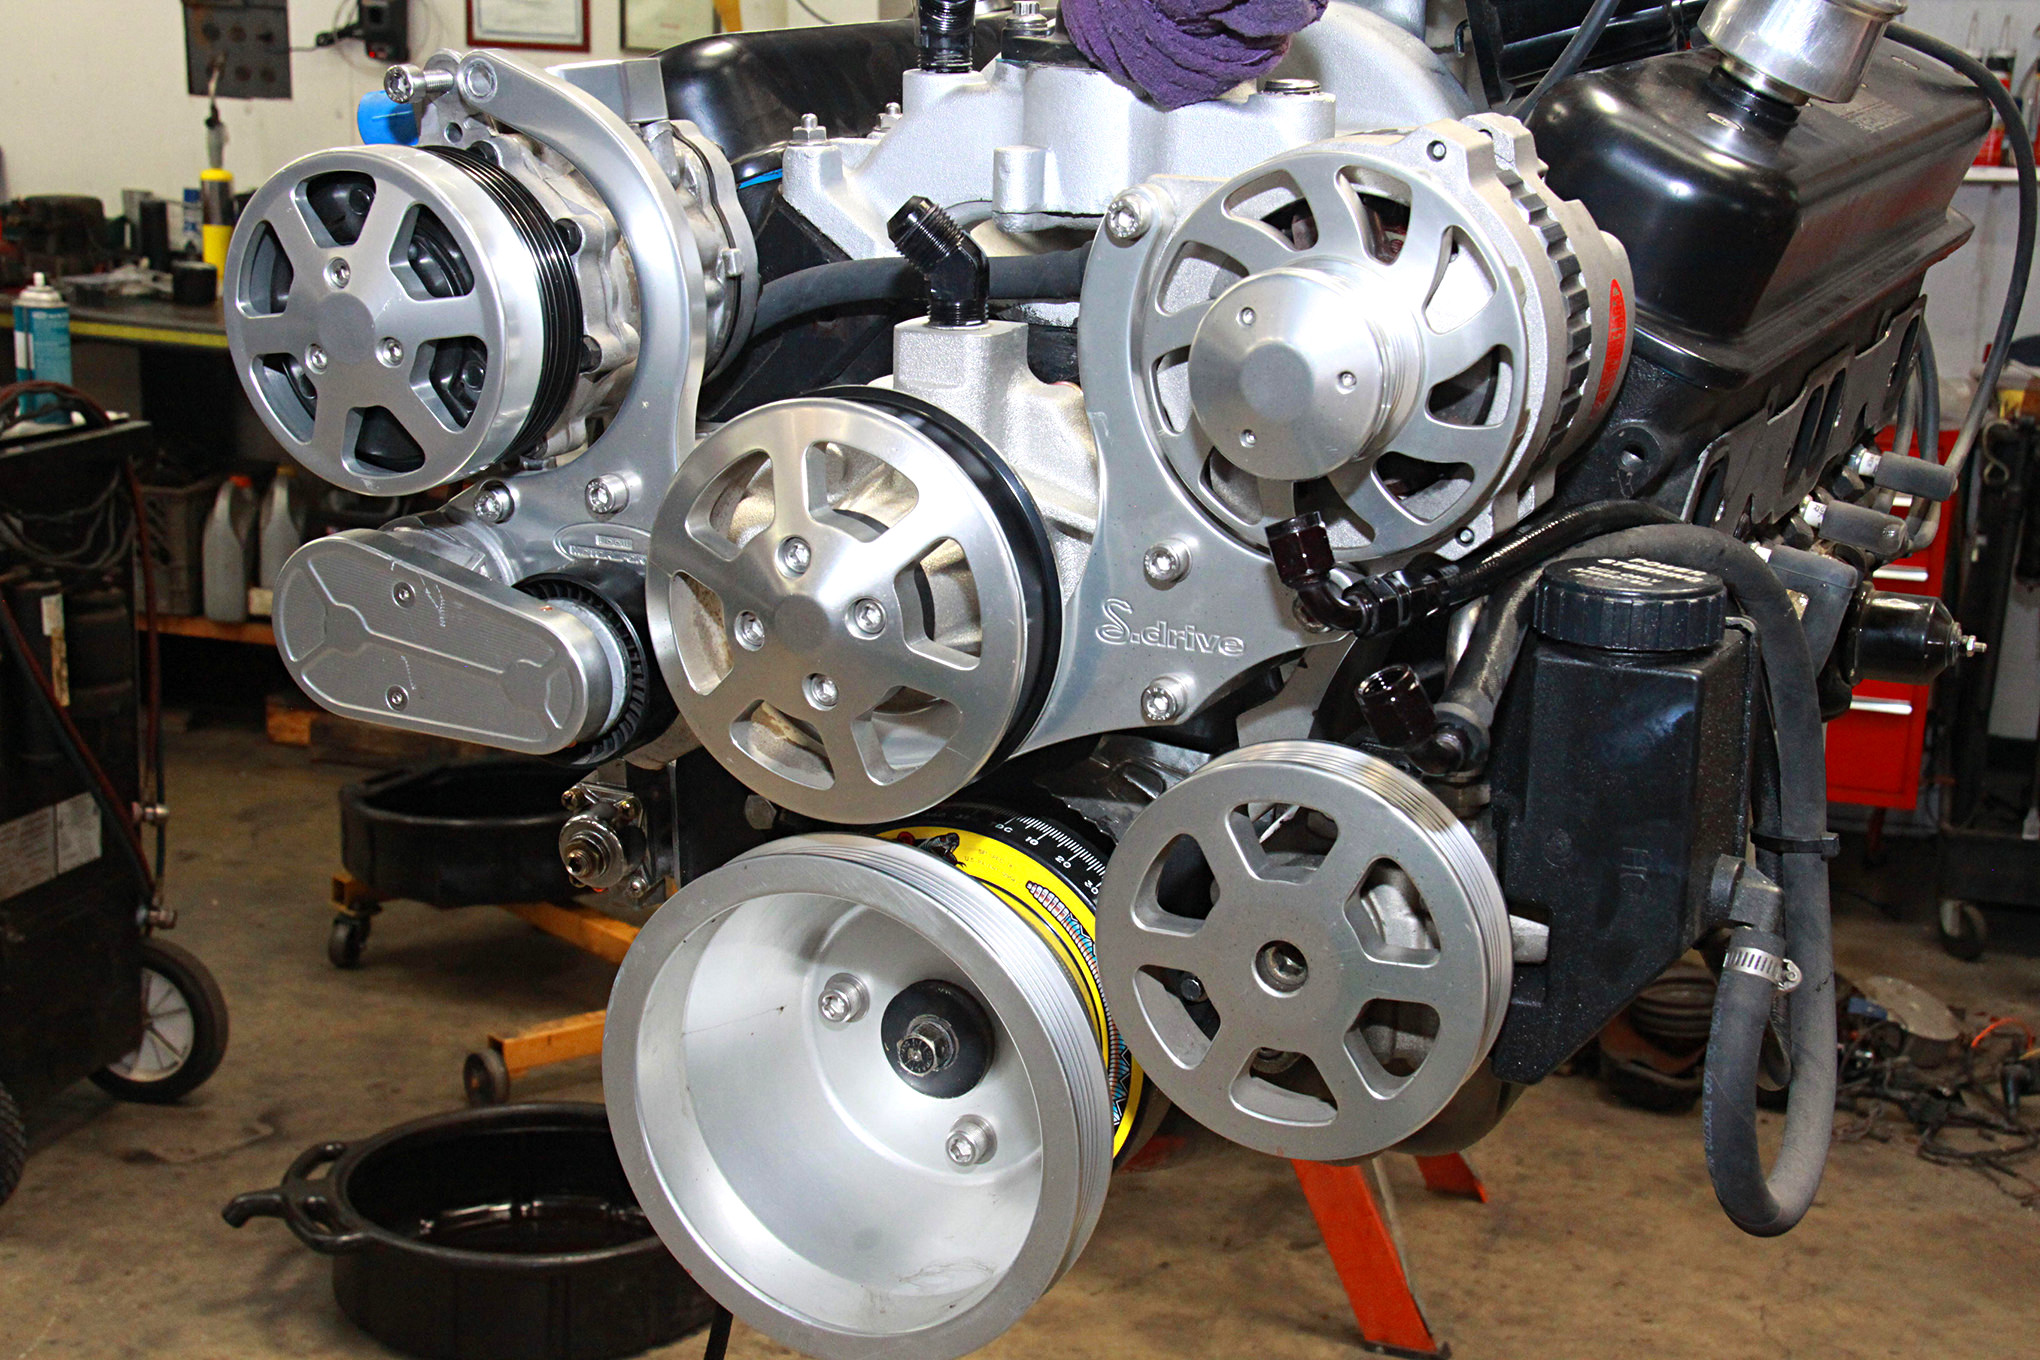 Chevrolet Performance SP350/385 crate engine swap